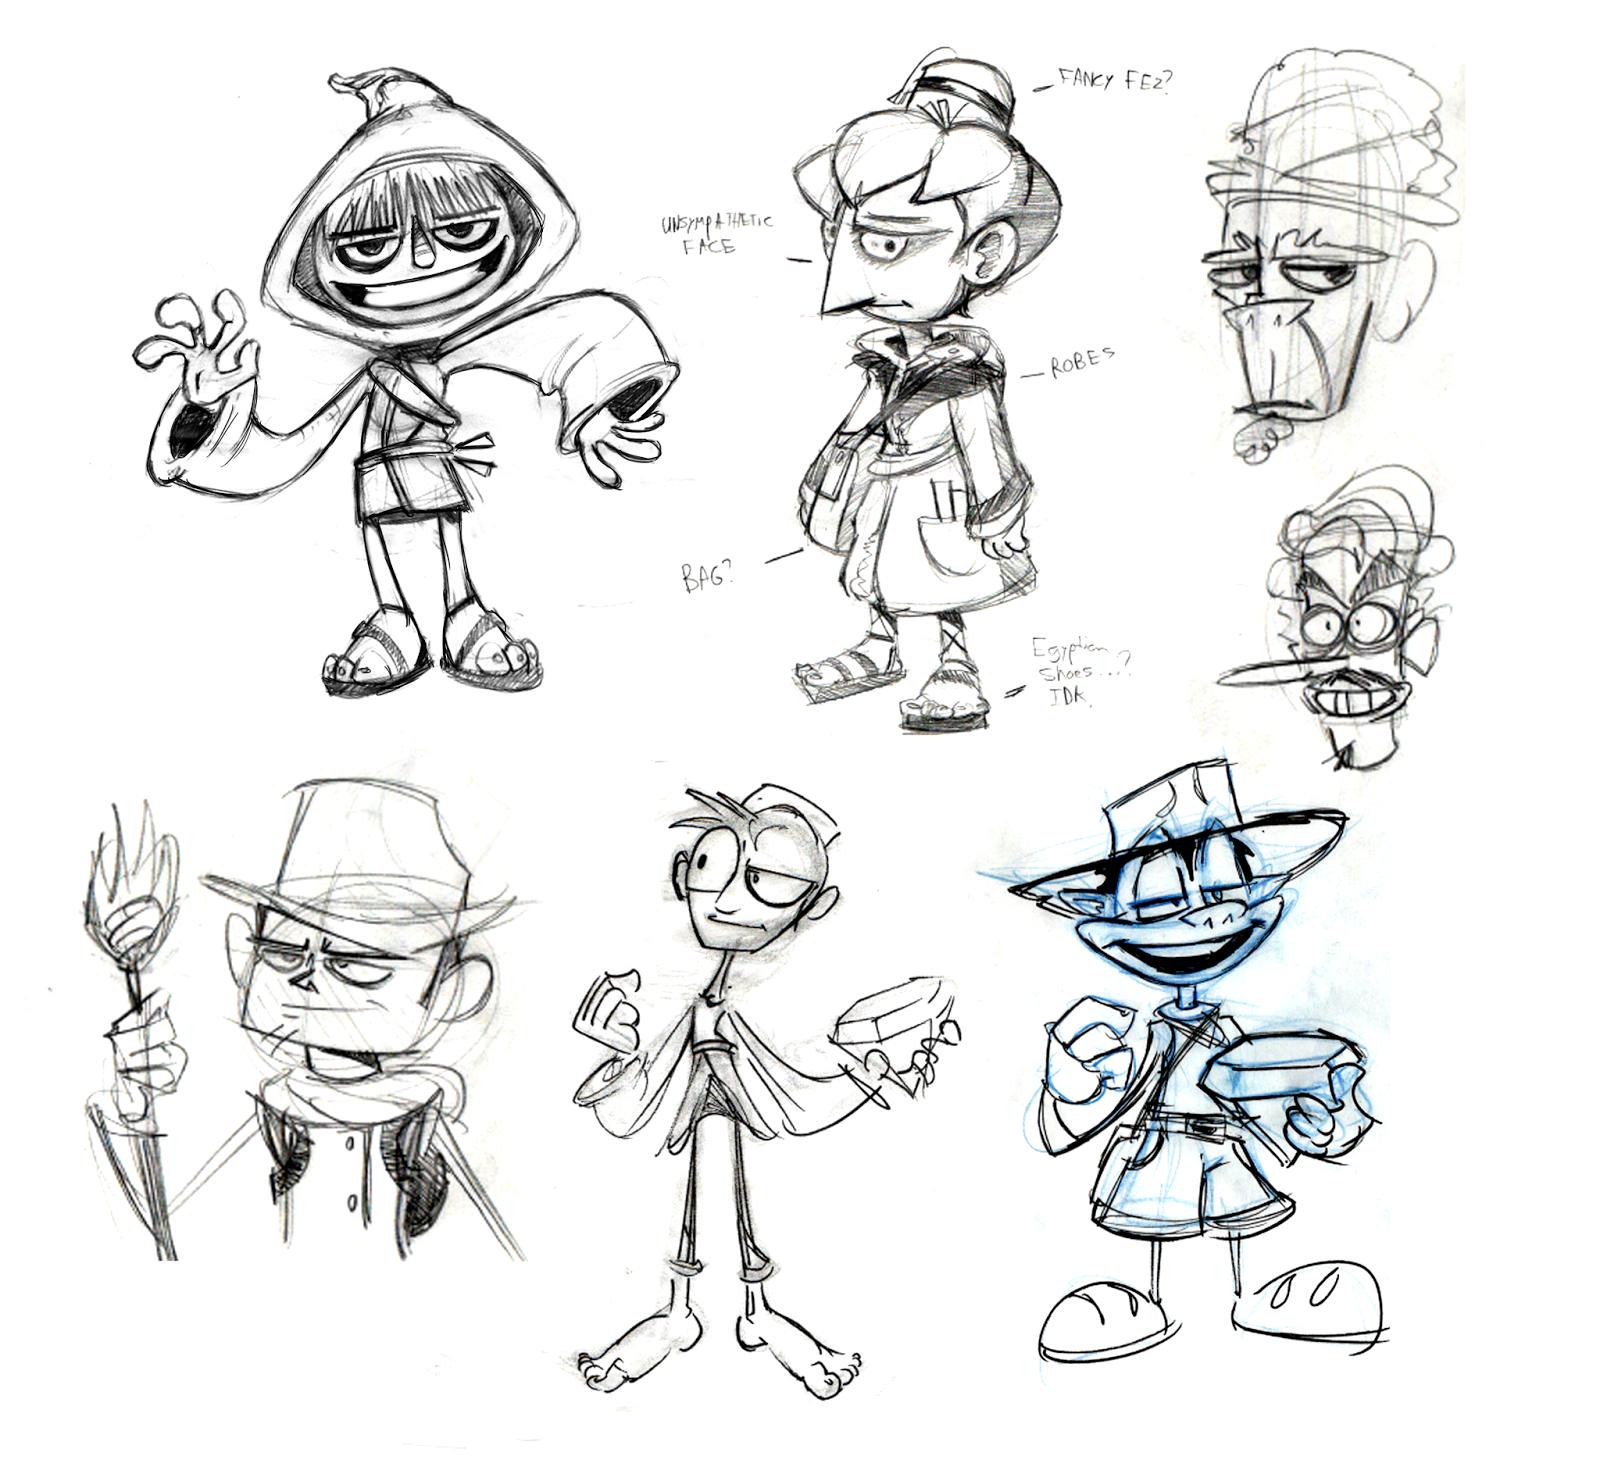 Carlos Ortega Art and Animation